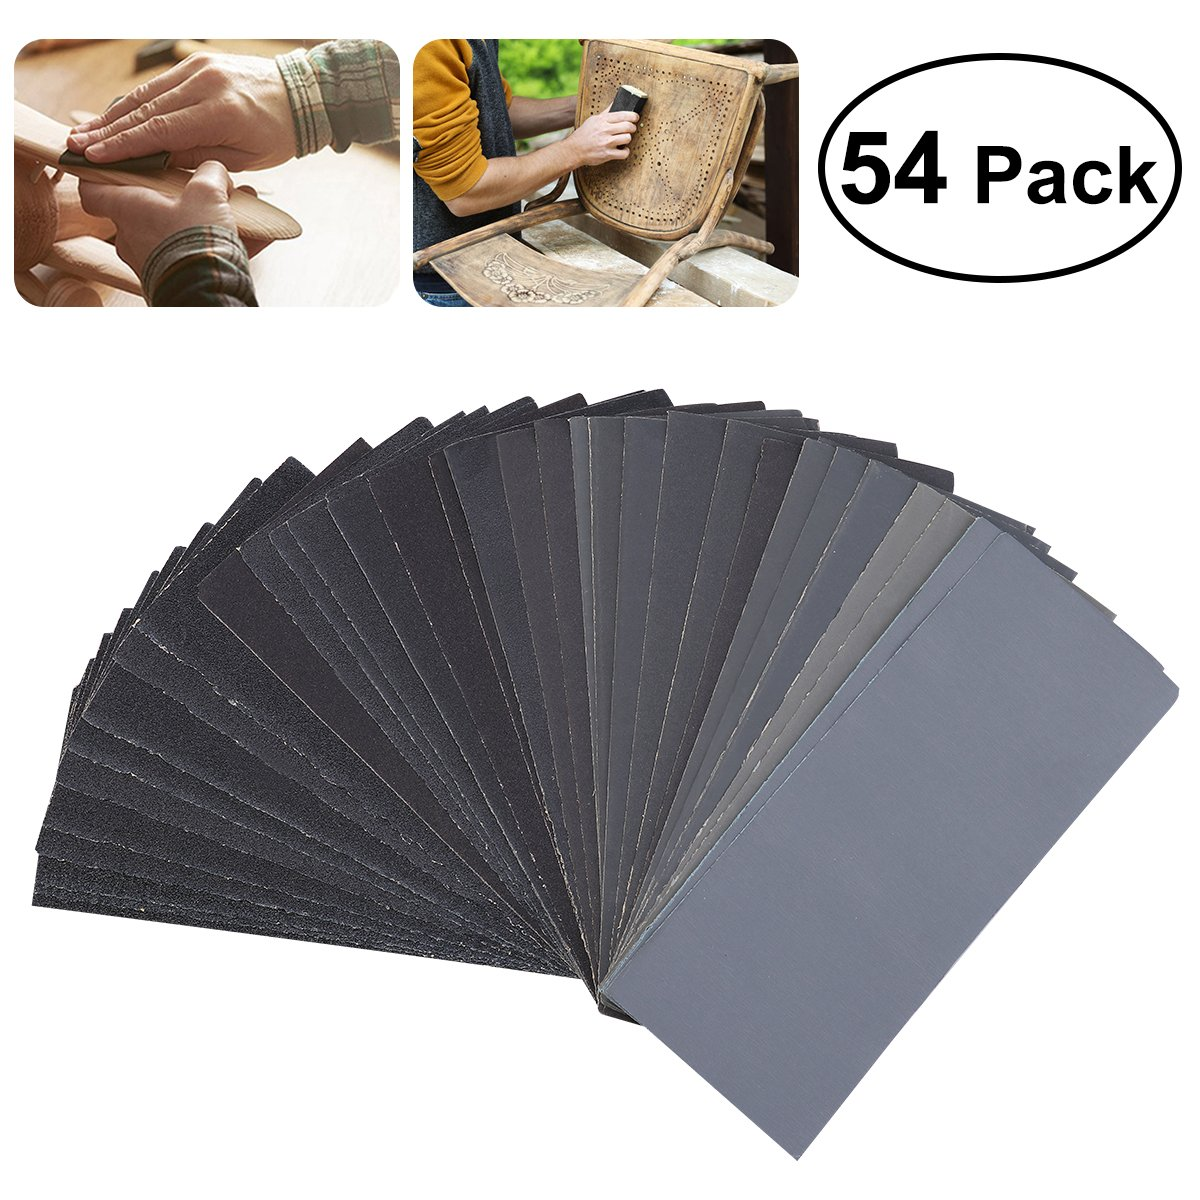 UEETEK 54pcs 60 to 3000 Grit Sandpaper Assortment Wet Dry Sand Paper for Automotive Sanding Wood by UEETEK